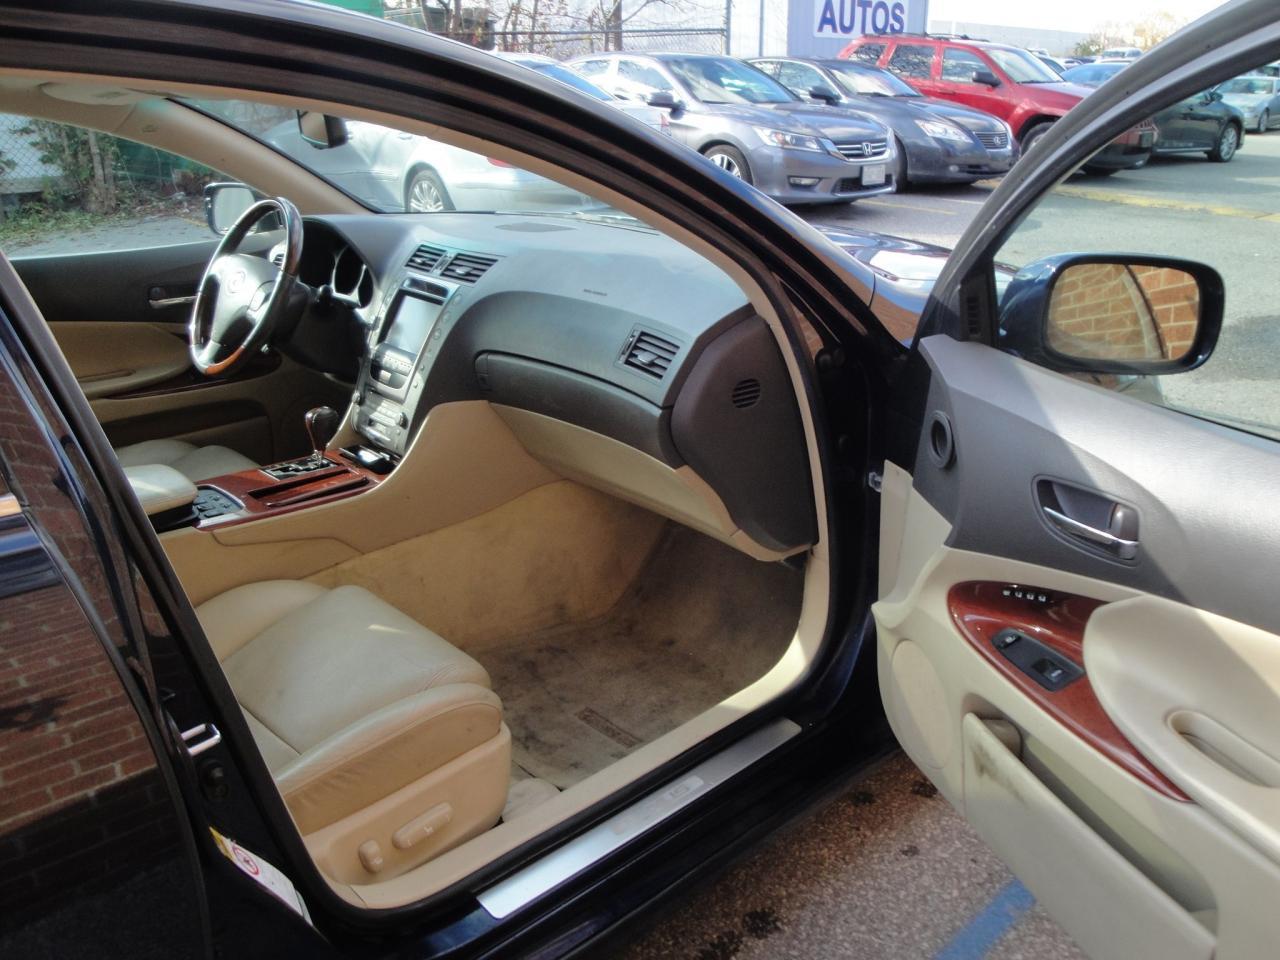 2007 Lexus GS 450H HYBRID